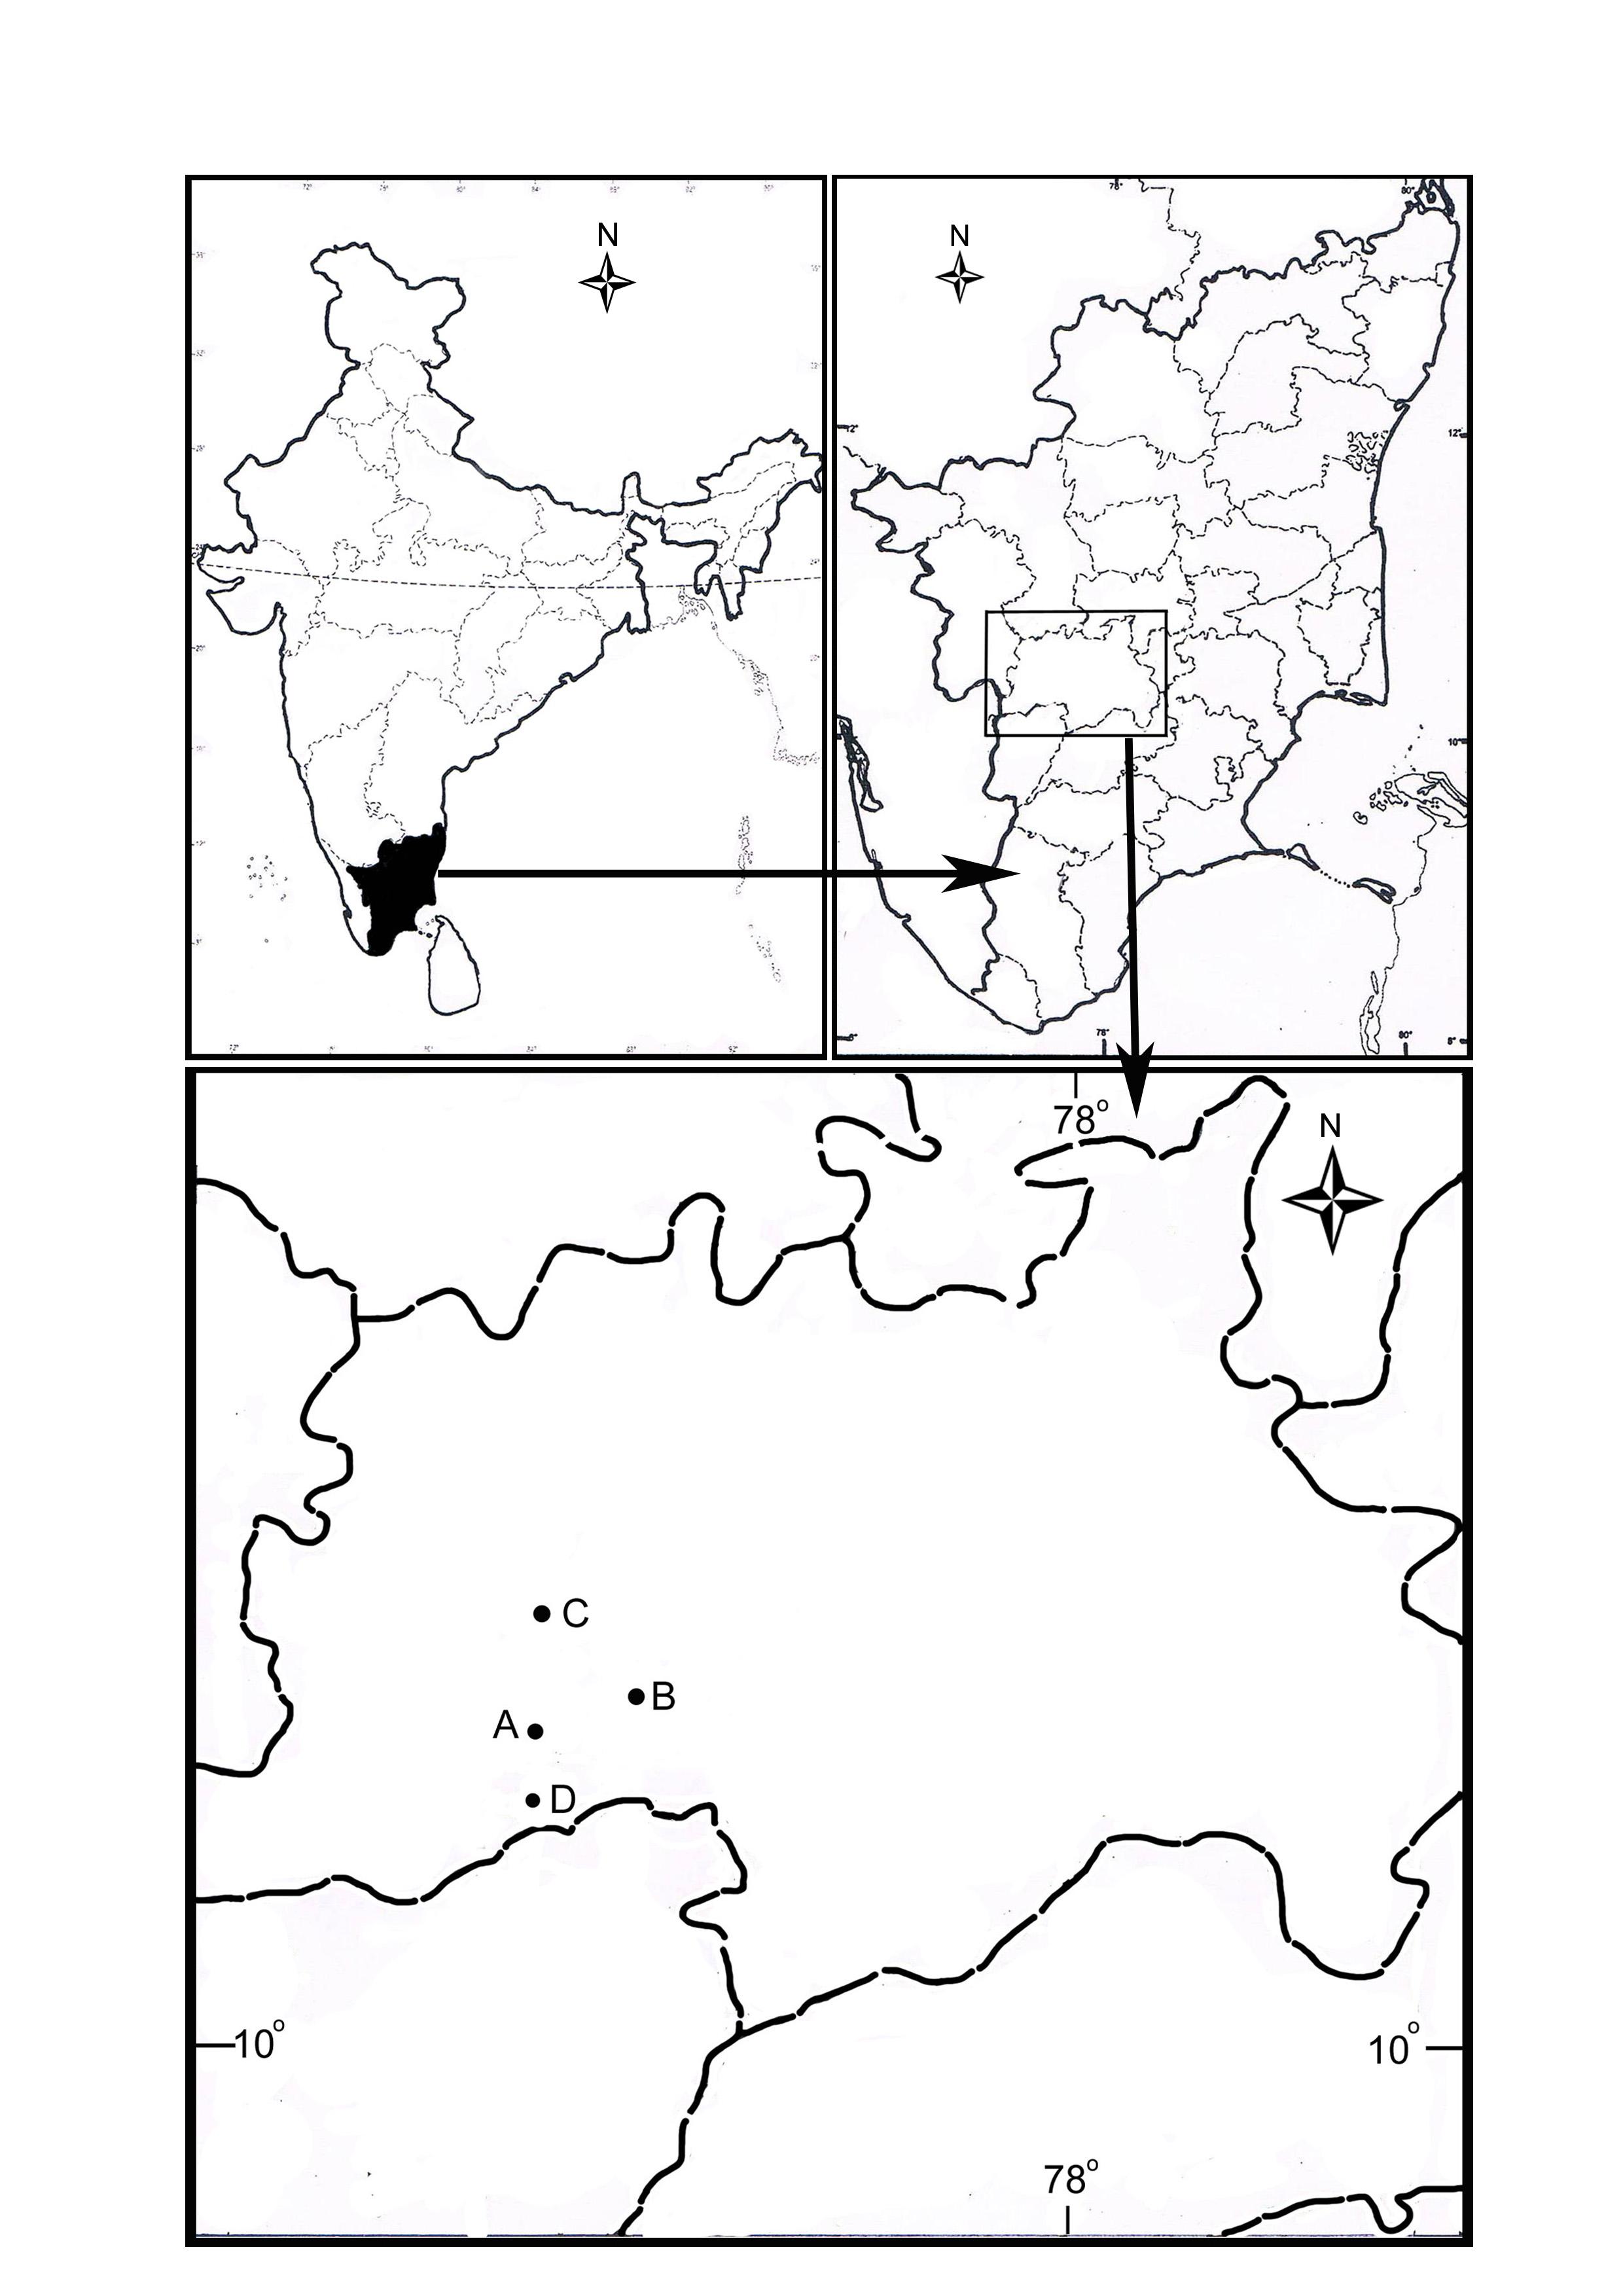 arbuscular mycorrhizal and dark septate endophyte fungal